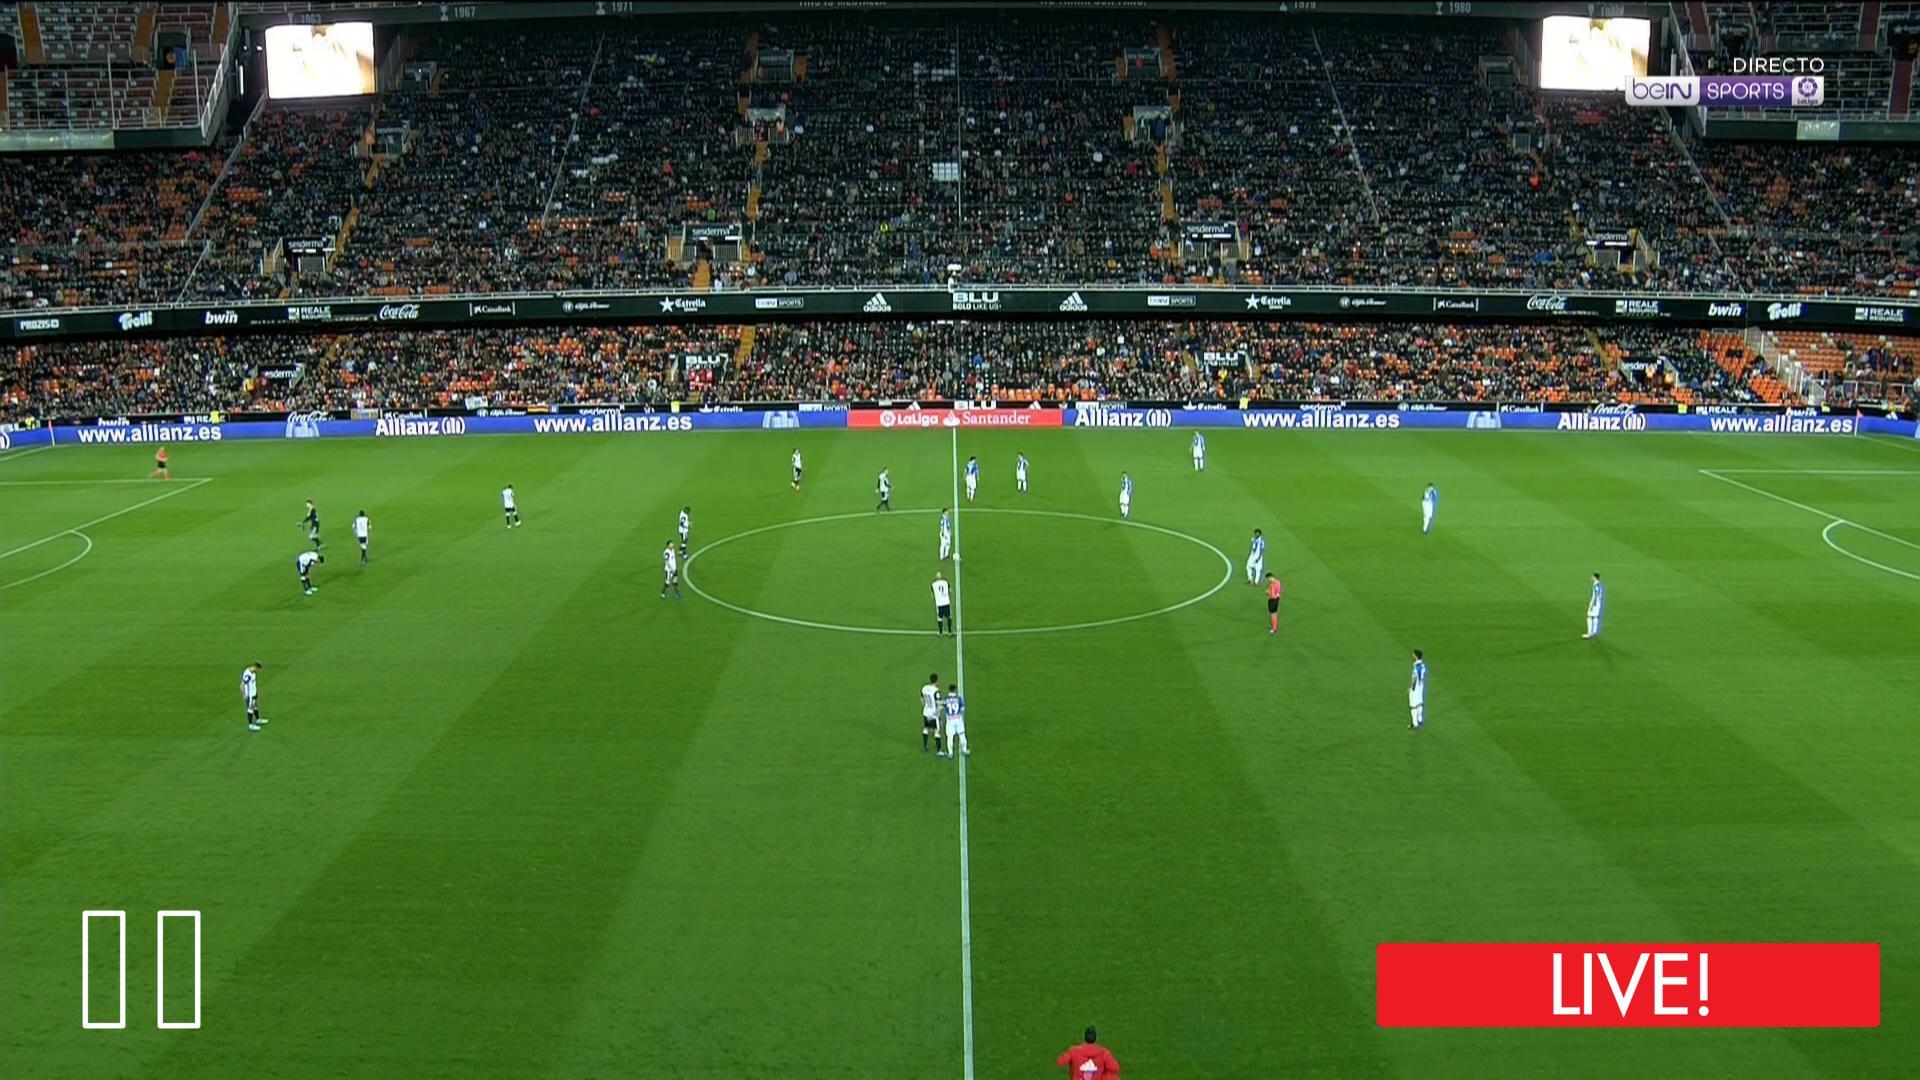 Live Streaming - ViPTV Player screenshot 3